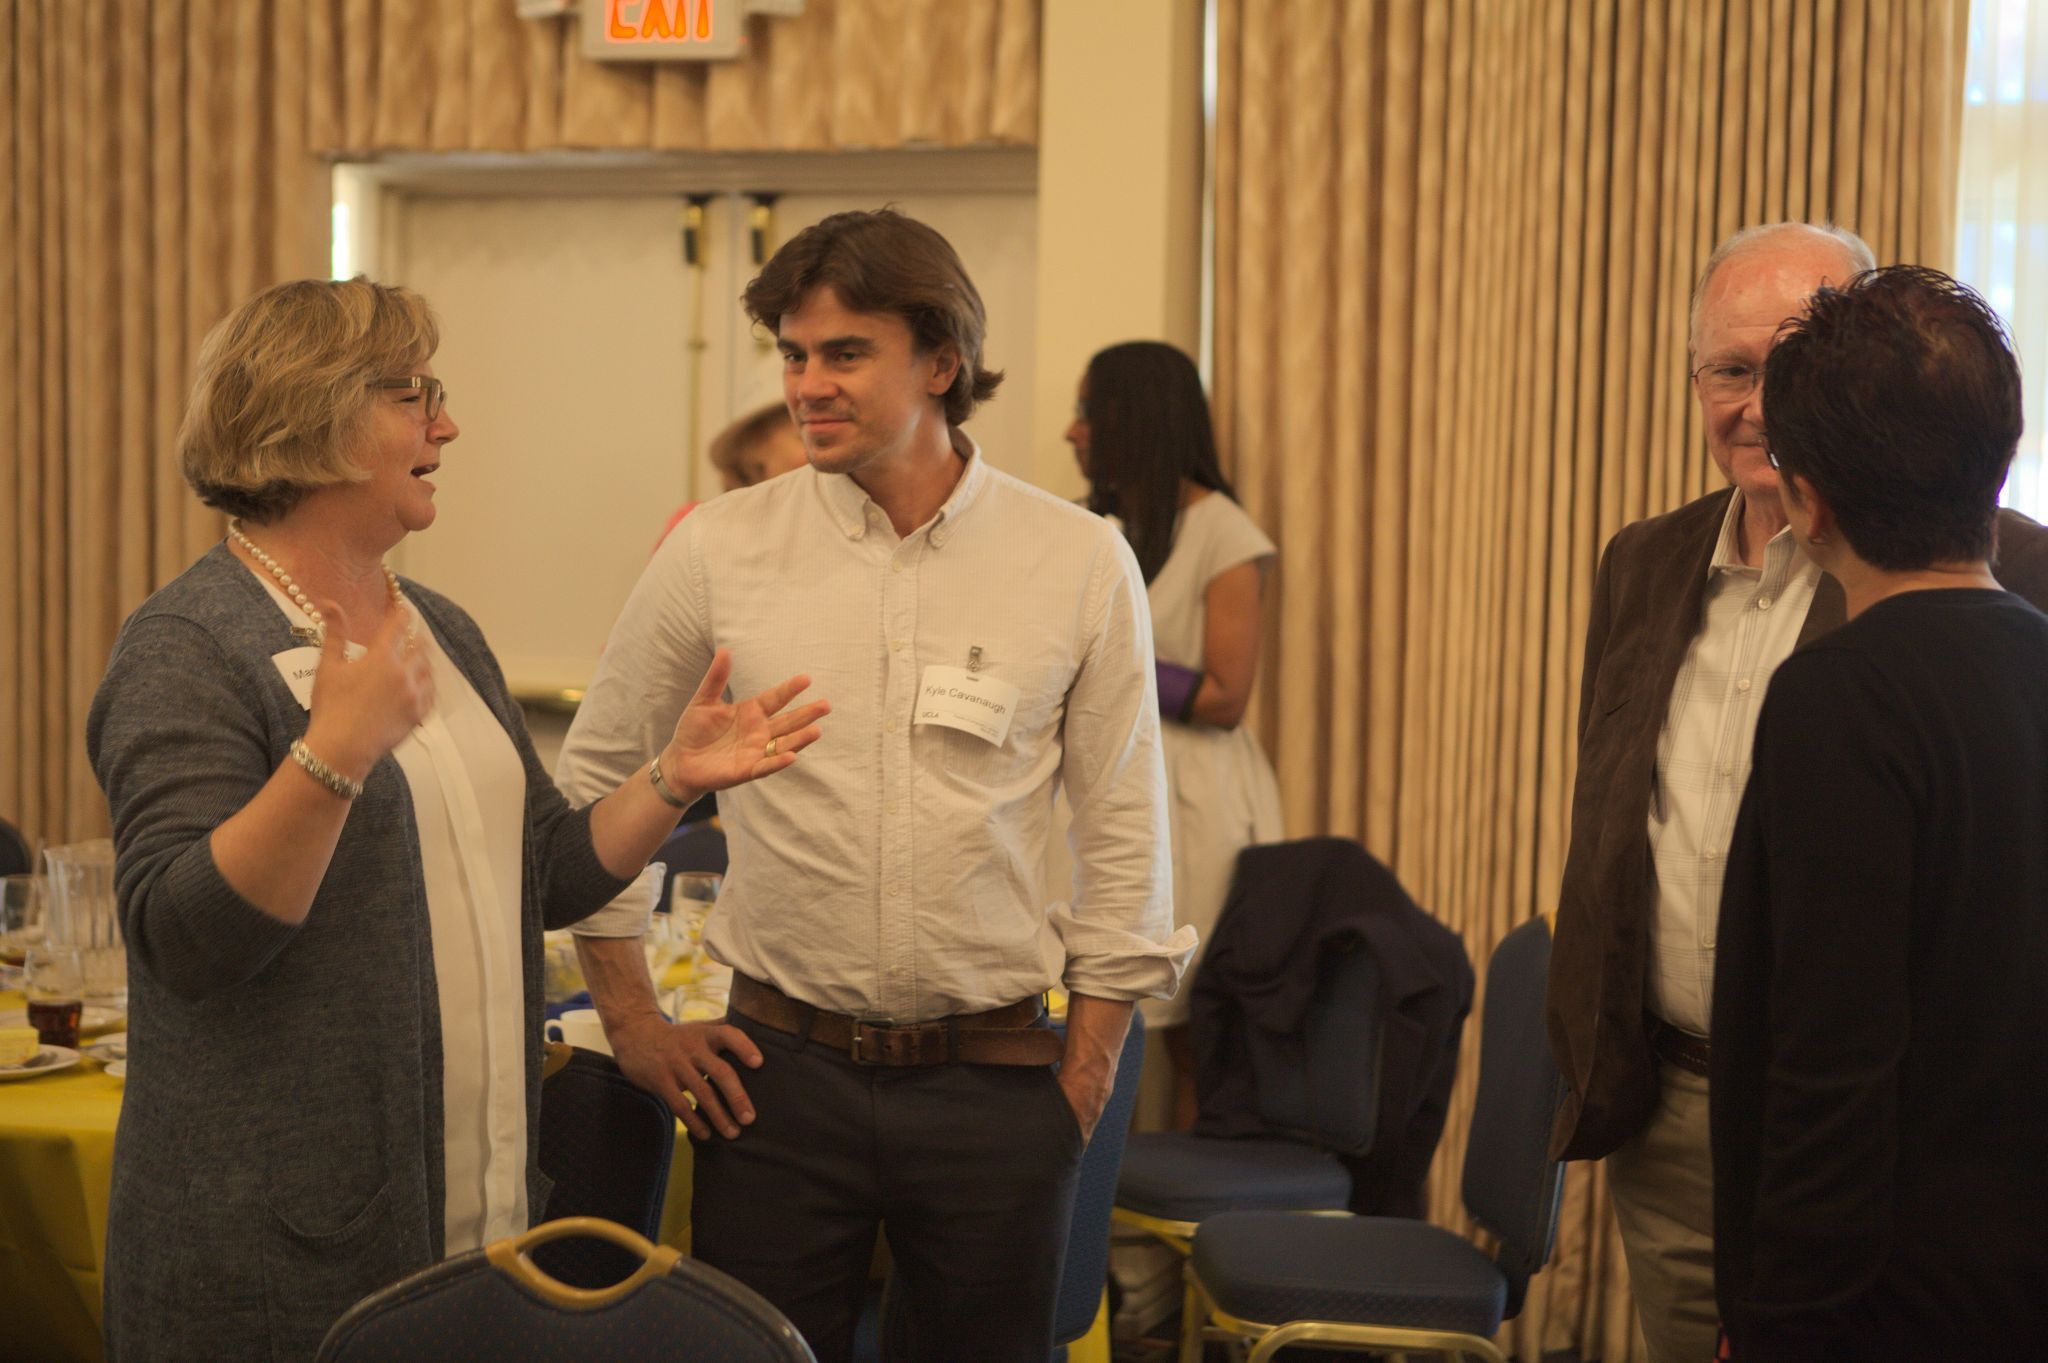 Professor Cavanaugh and Marianne Wright